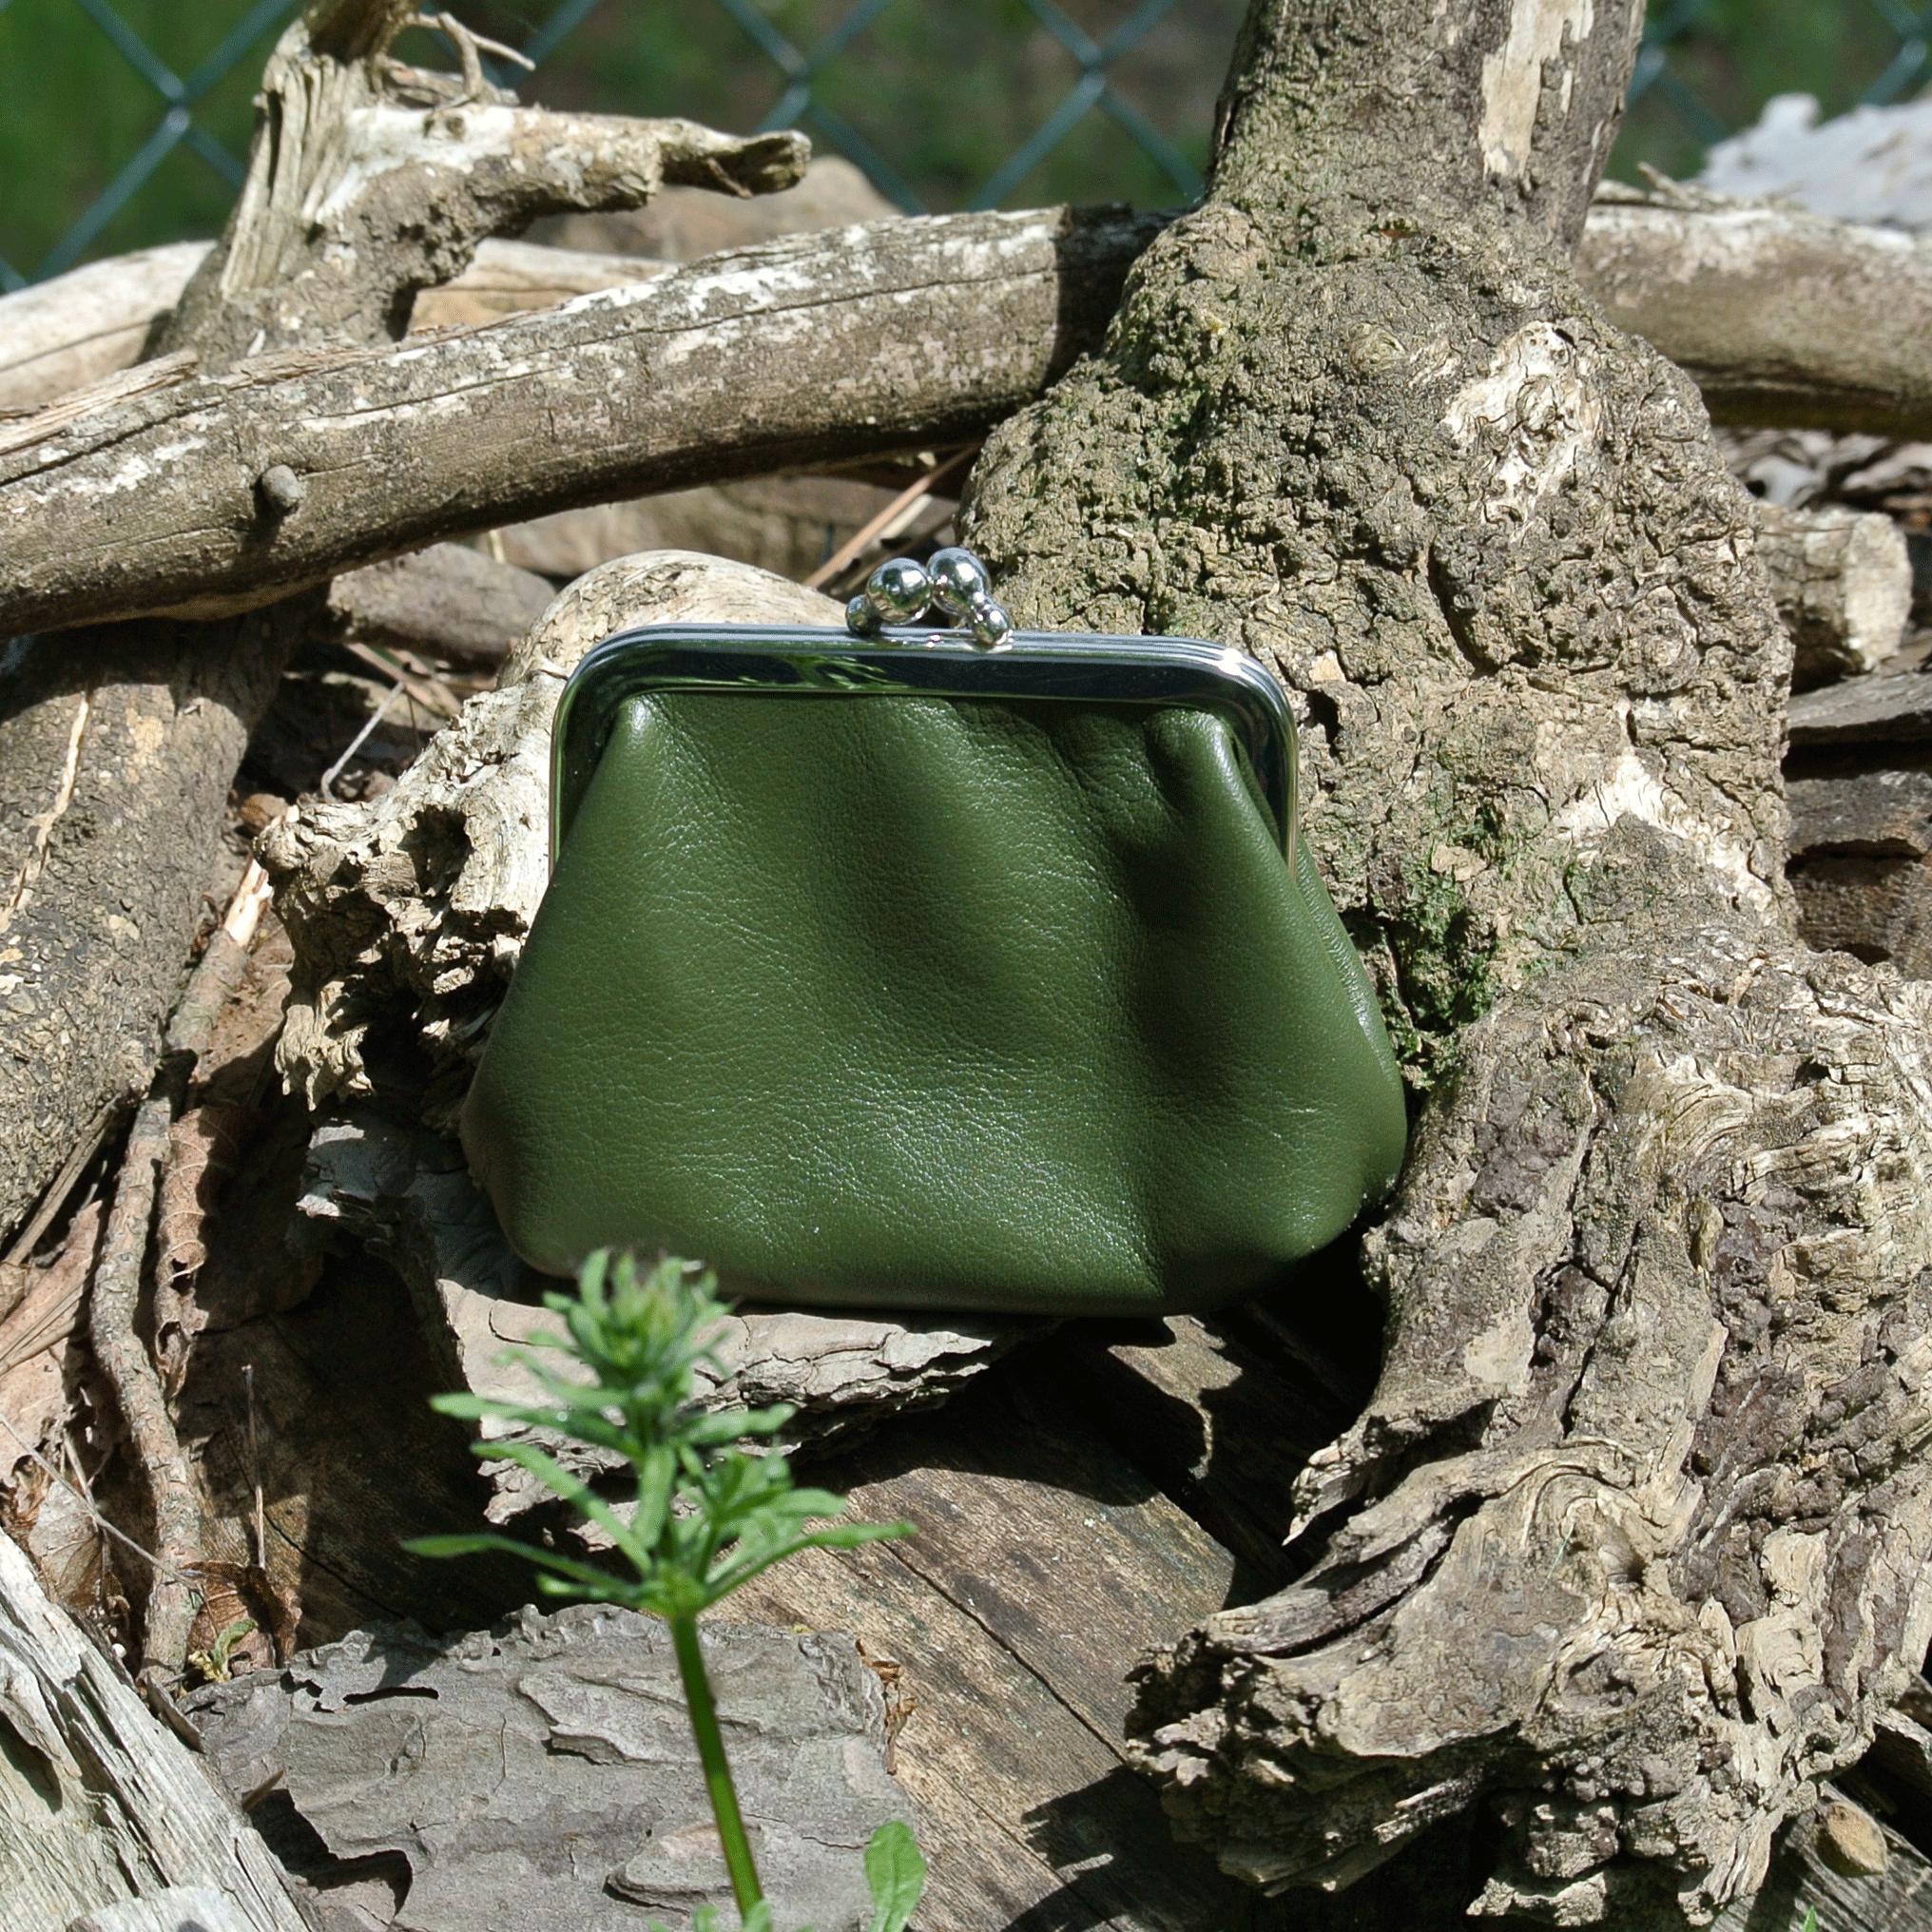 la-cartabliere-fabrique-en-france-made-in-france-porte-monnaie-reine-en-cuir-nappa-vert